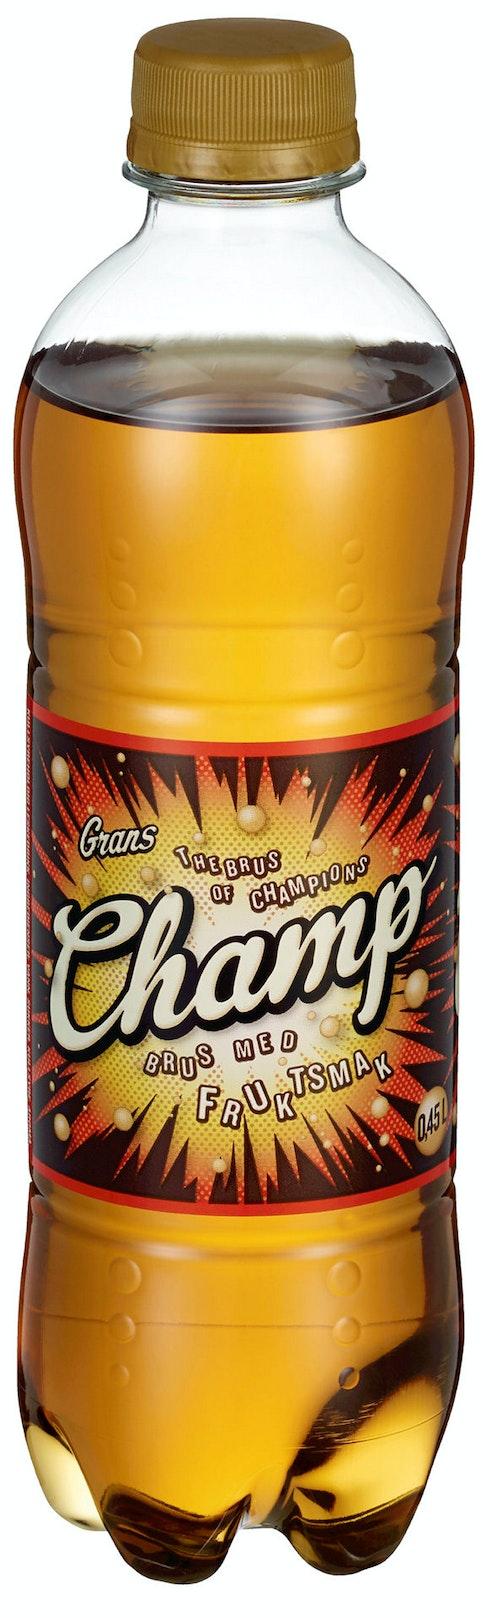 Grans Bryggeri Champ 0,45 l